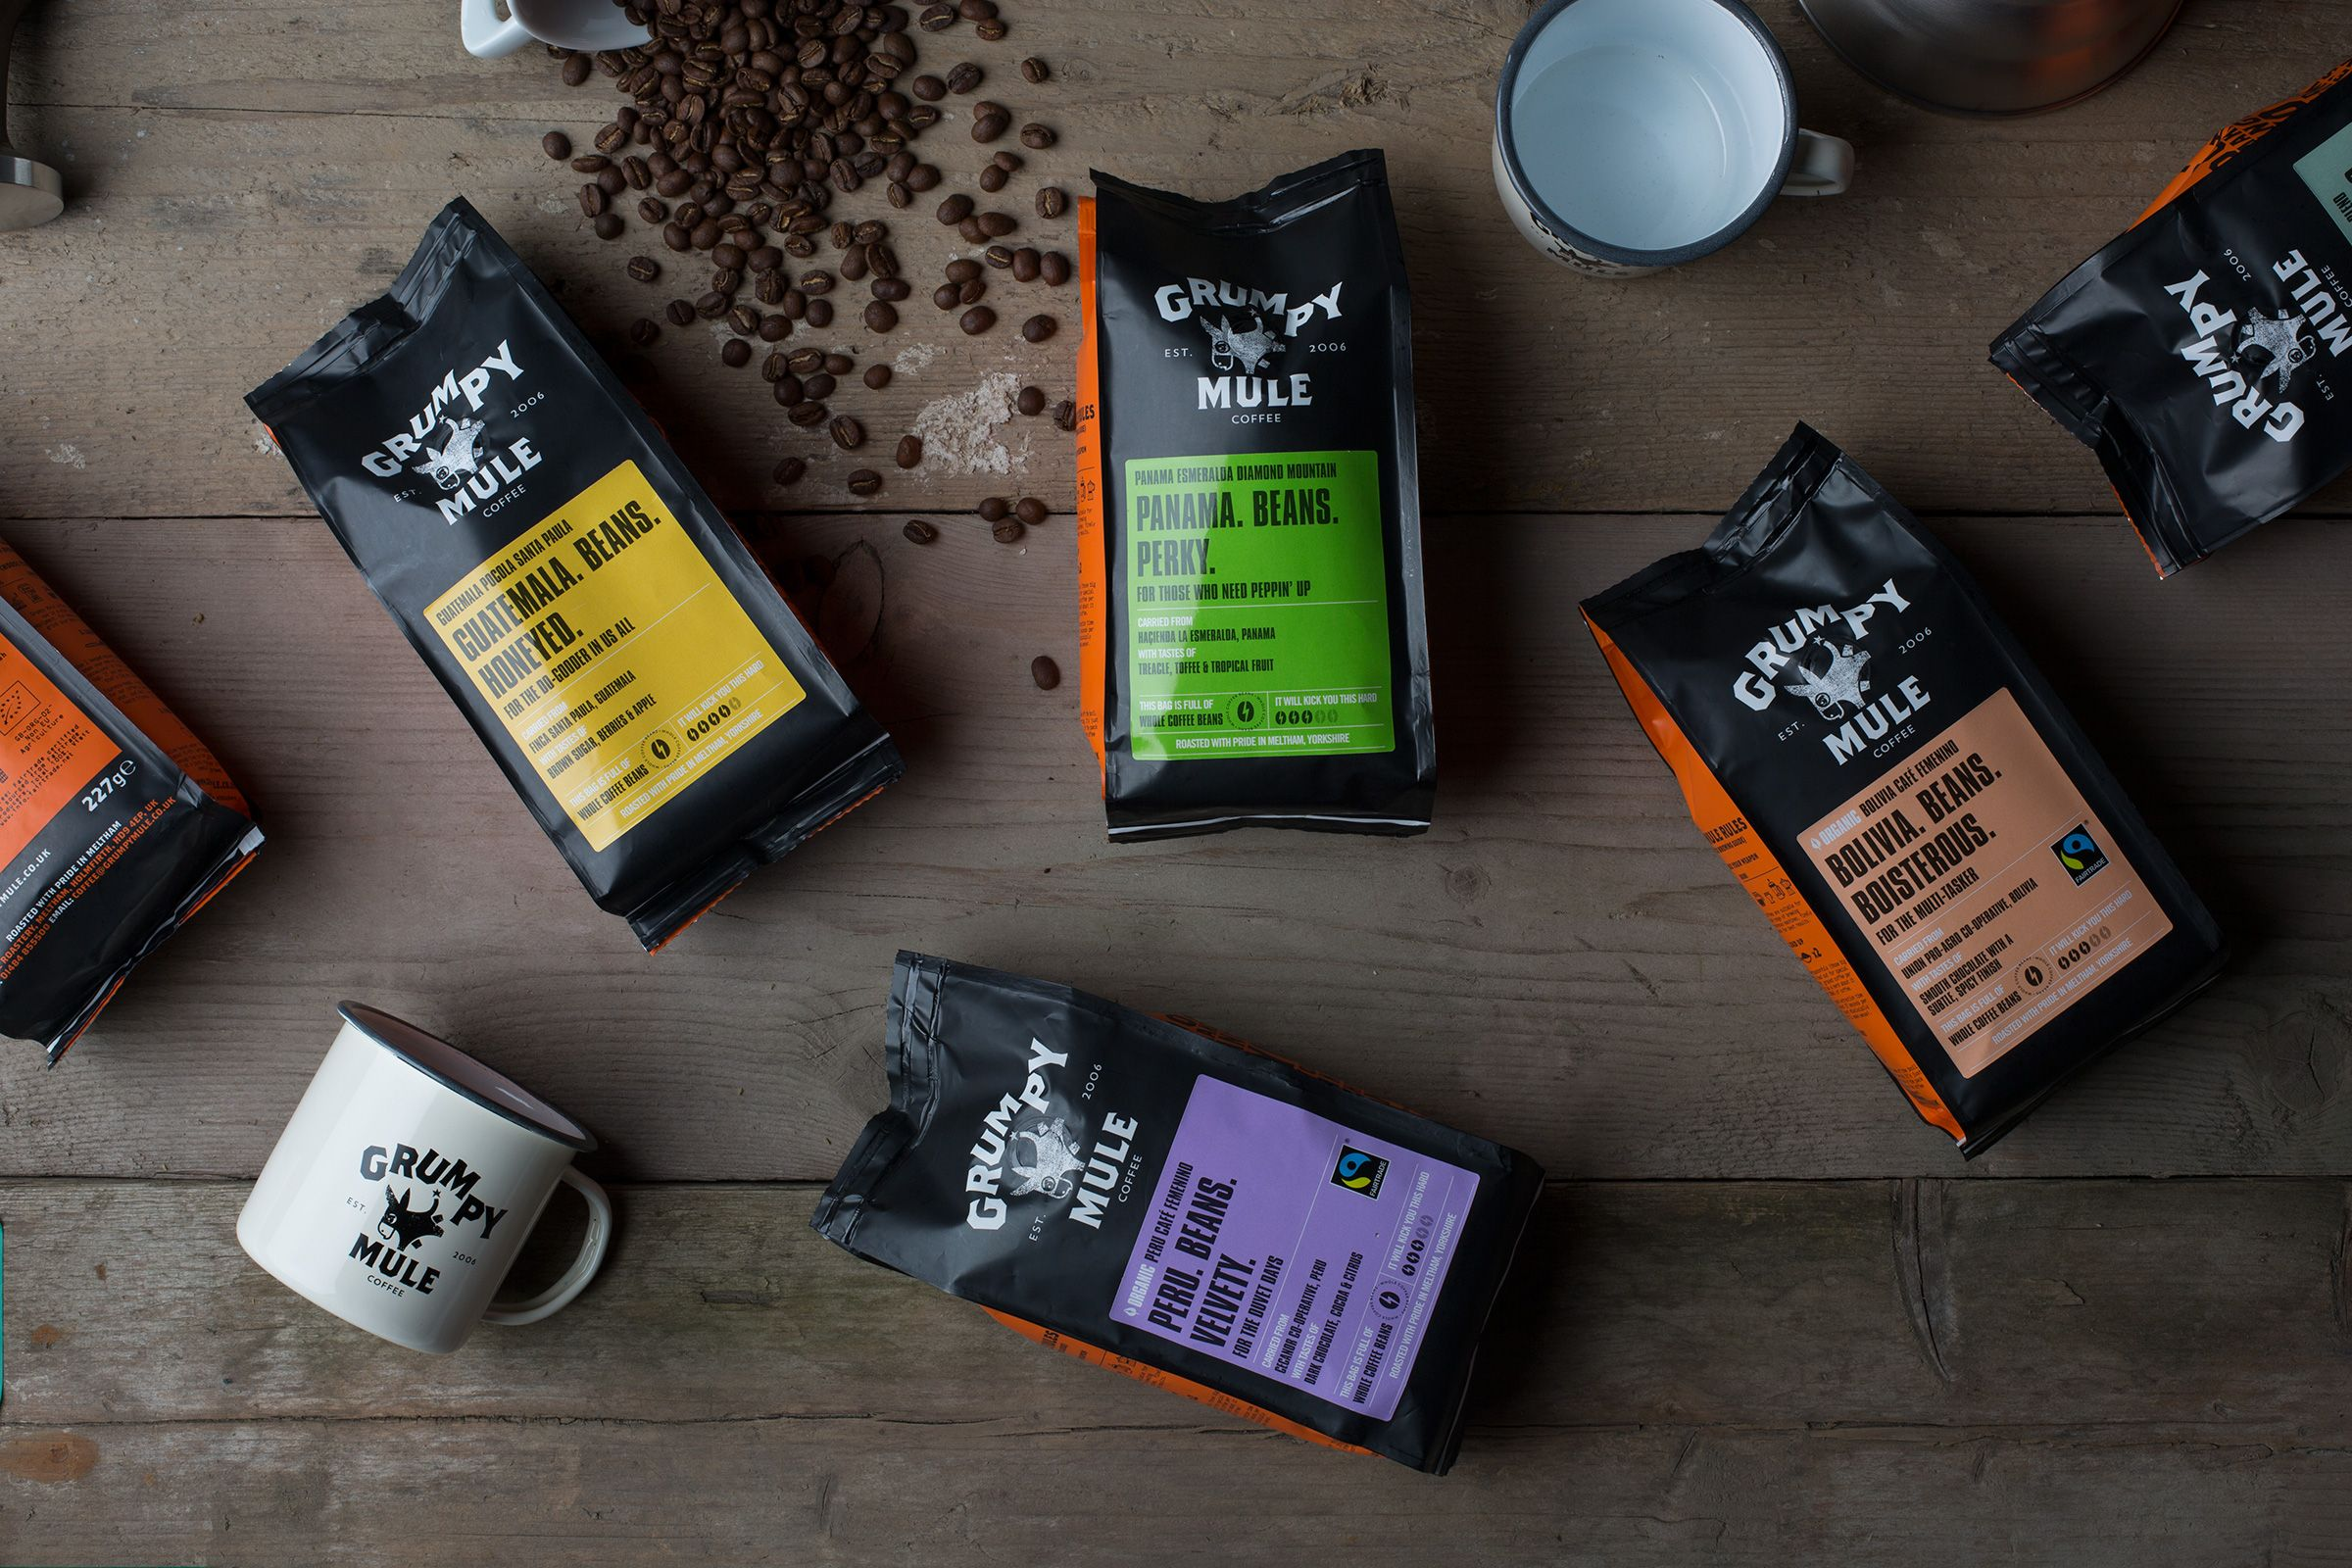 Image result for grumpy mule coffee Fair trade coffee